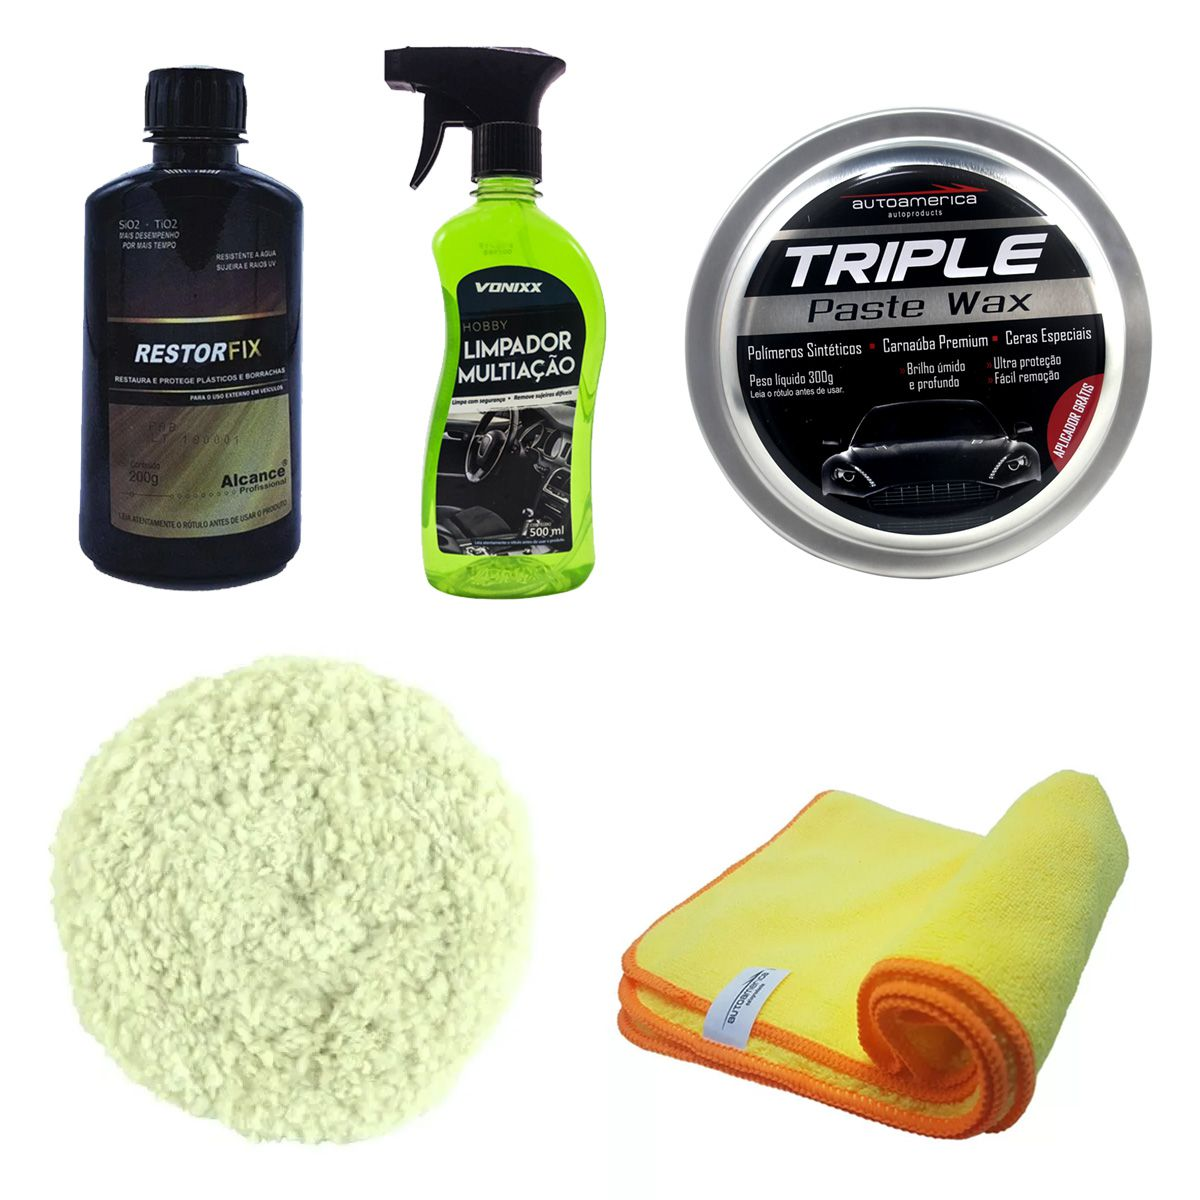 Kit Cera Paste Wax + Restorfix + Apc Vonixx + Flanela + Boina Dupla Face